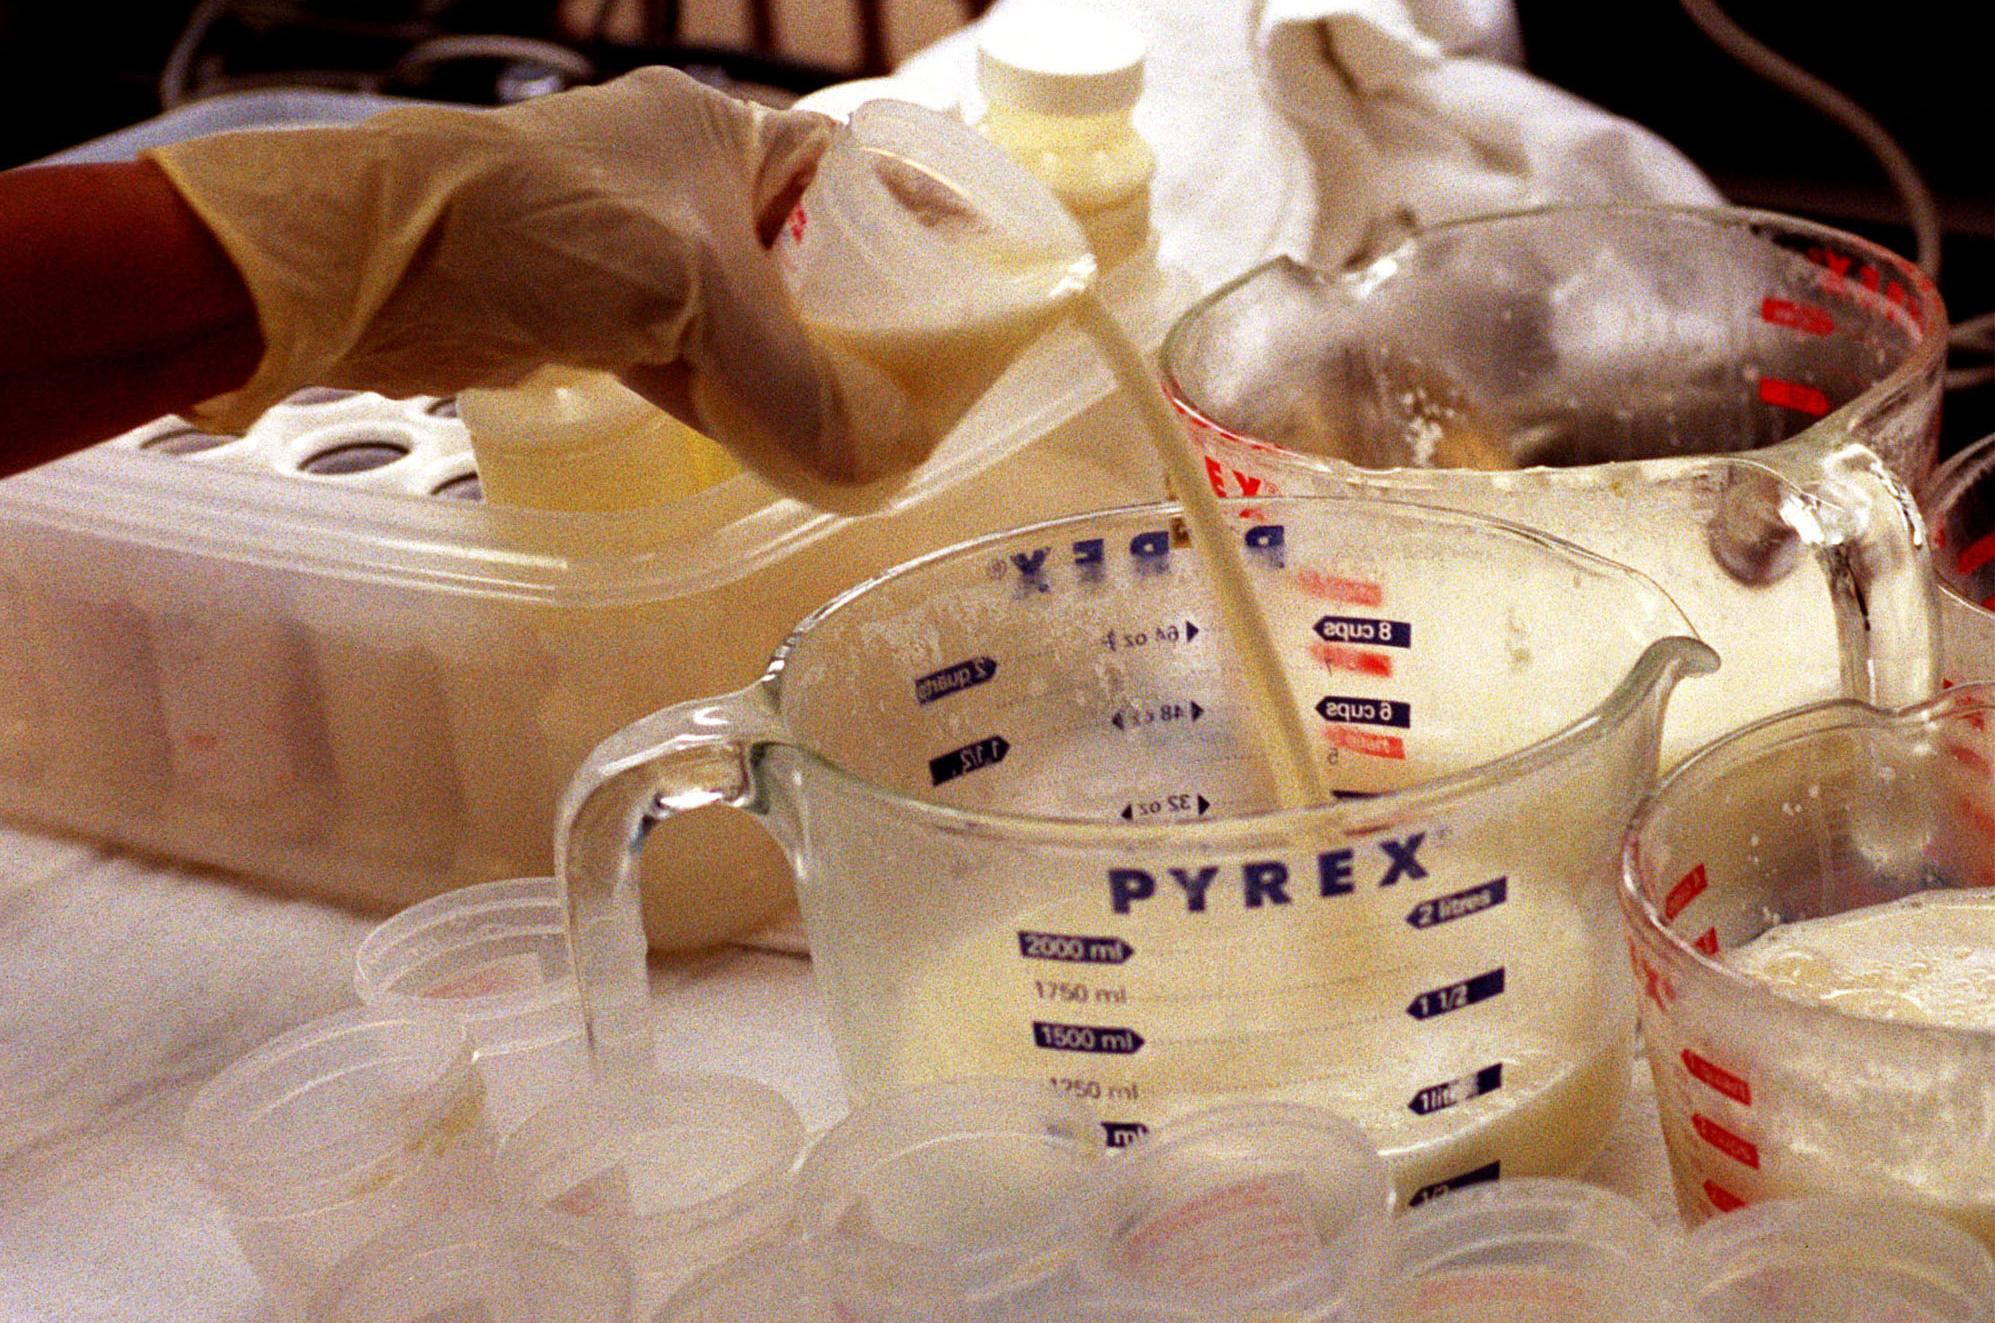 Cambodia Halts Export Of Human Breast Milk The Spokesman Review